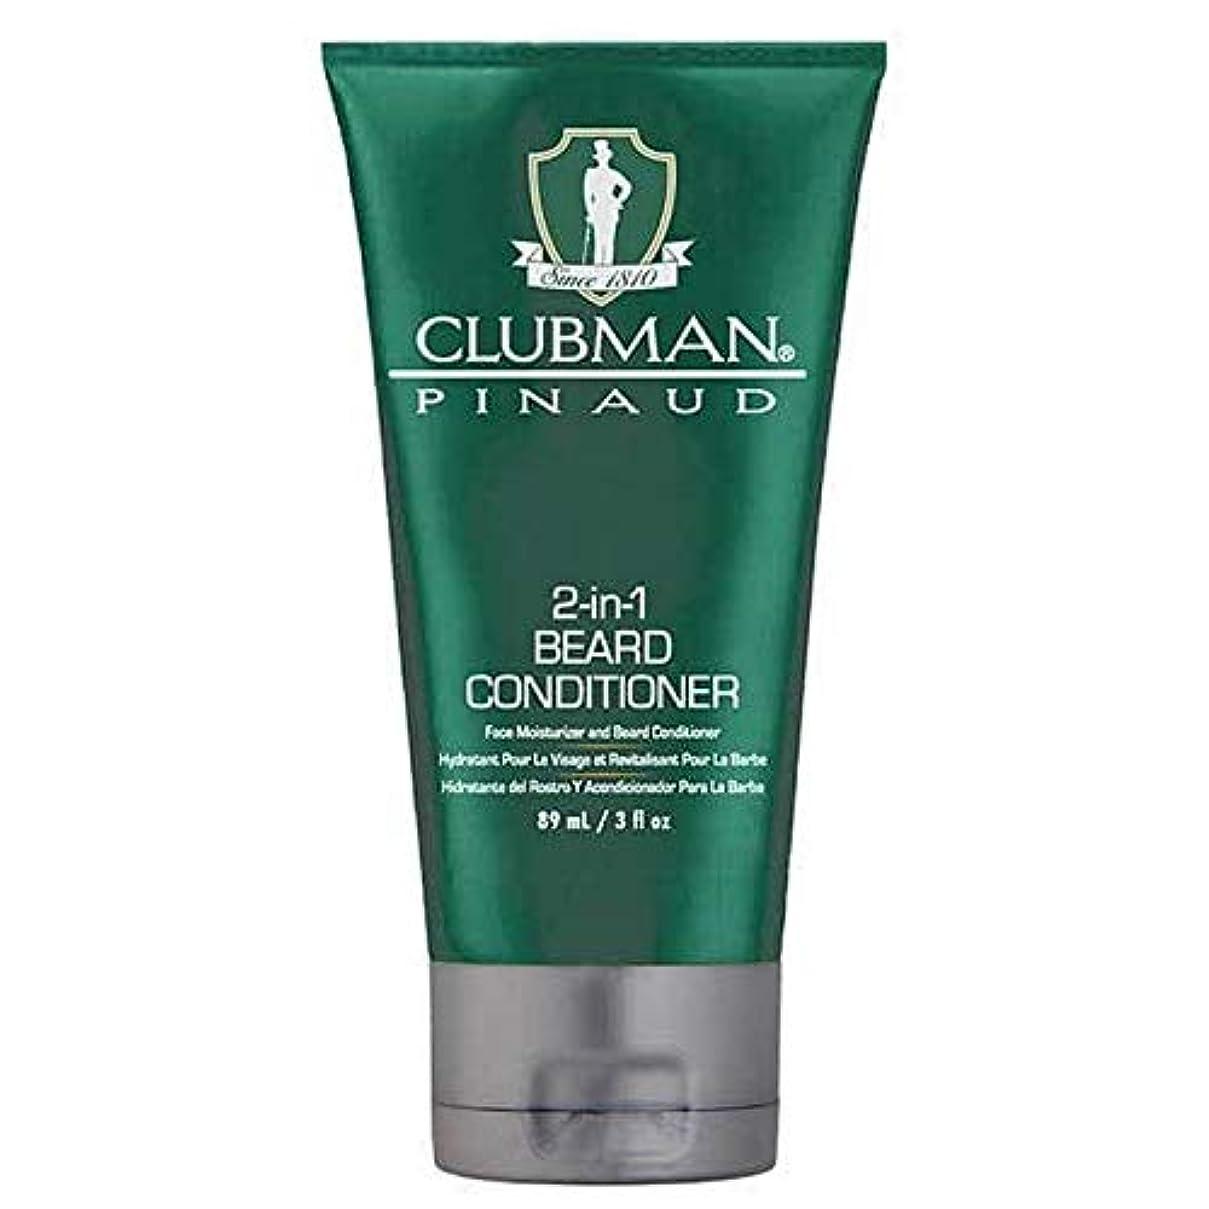 [Clubman ] クラブマン2-In-1髭コンディショナー89ミリリットル - Clubman 2-in-1 Beard Conditioner 89ml [並行輸入品]